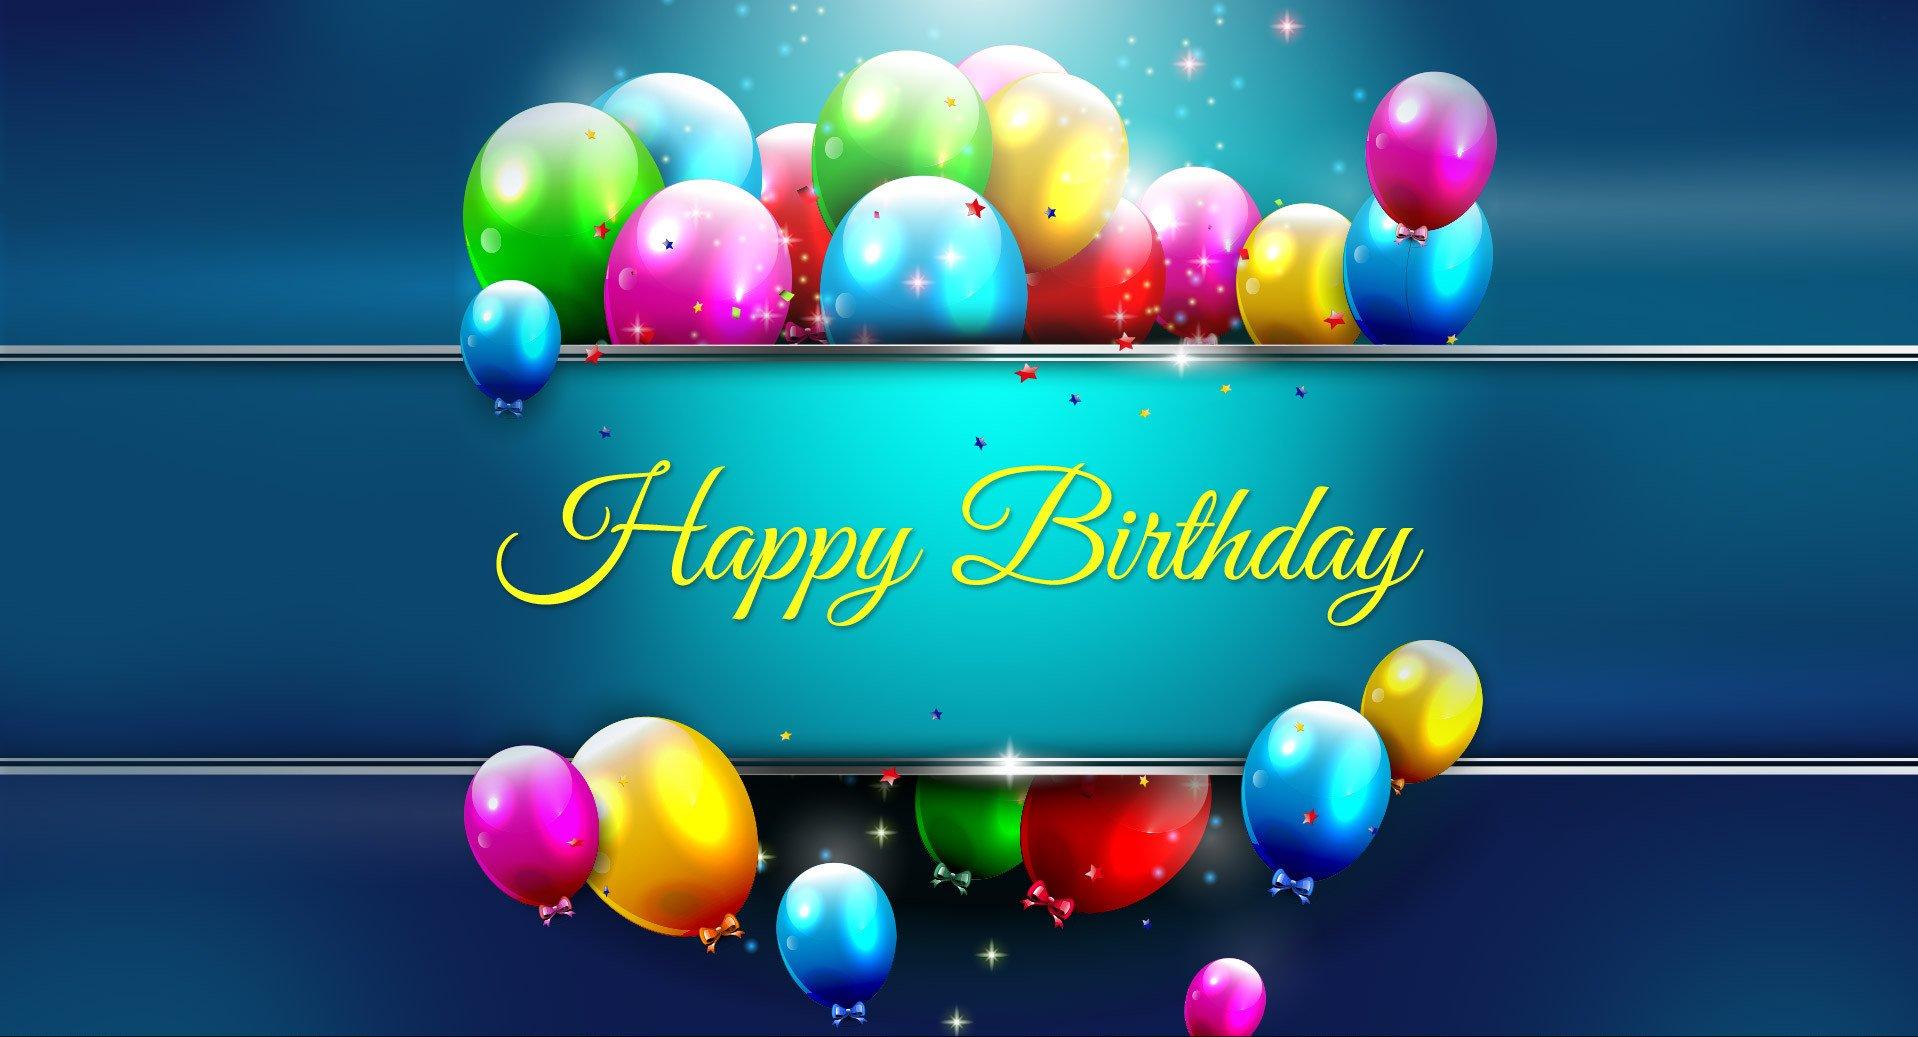 Happy Birthday Balloons HD Wallpaper Clip Art 1918x1037